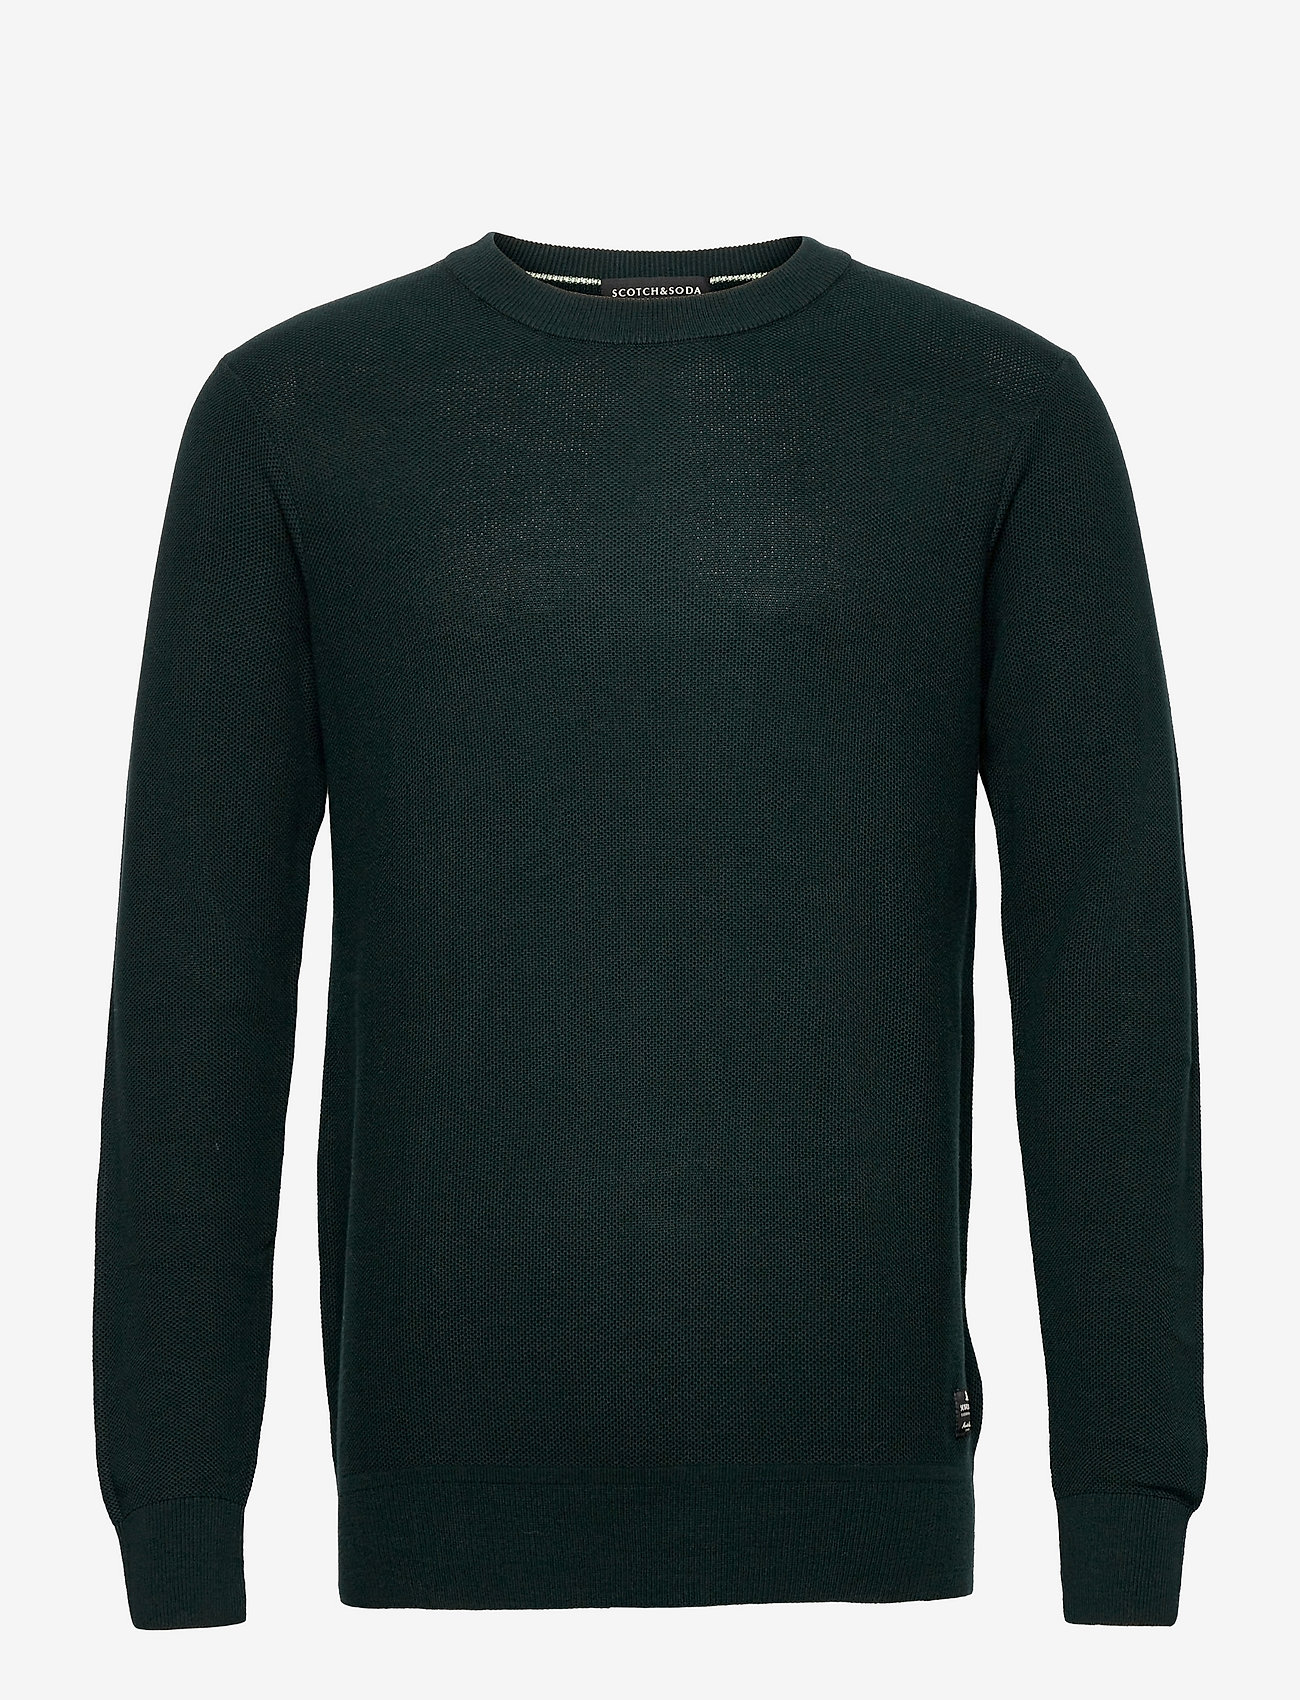 Scotch & Soda - Organic cotton crewneck pull in structured knit - basic gebreide truien - sea green - 0